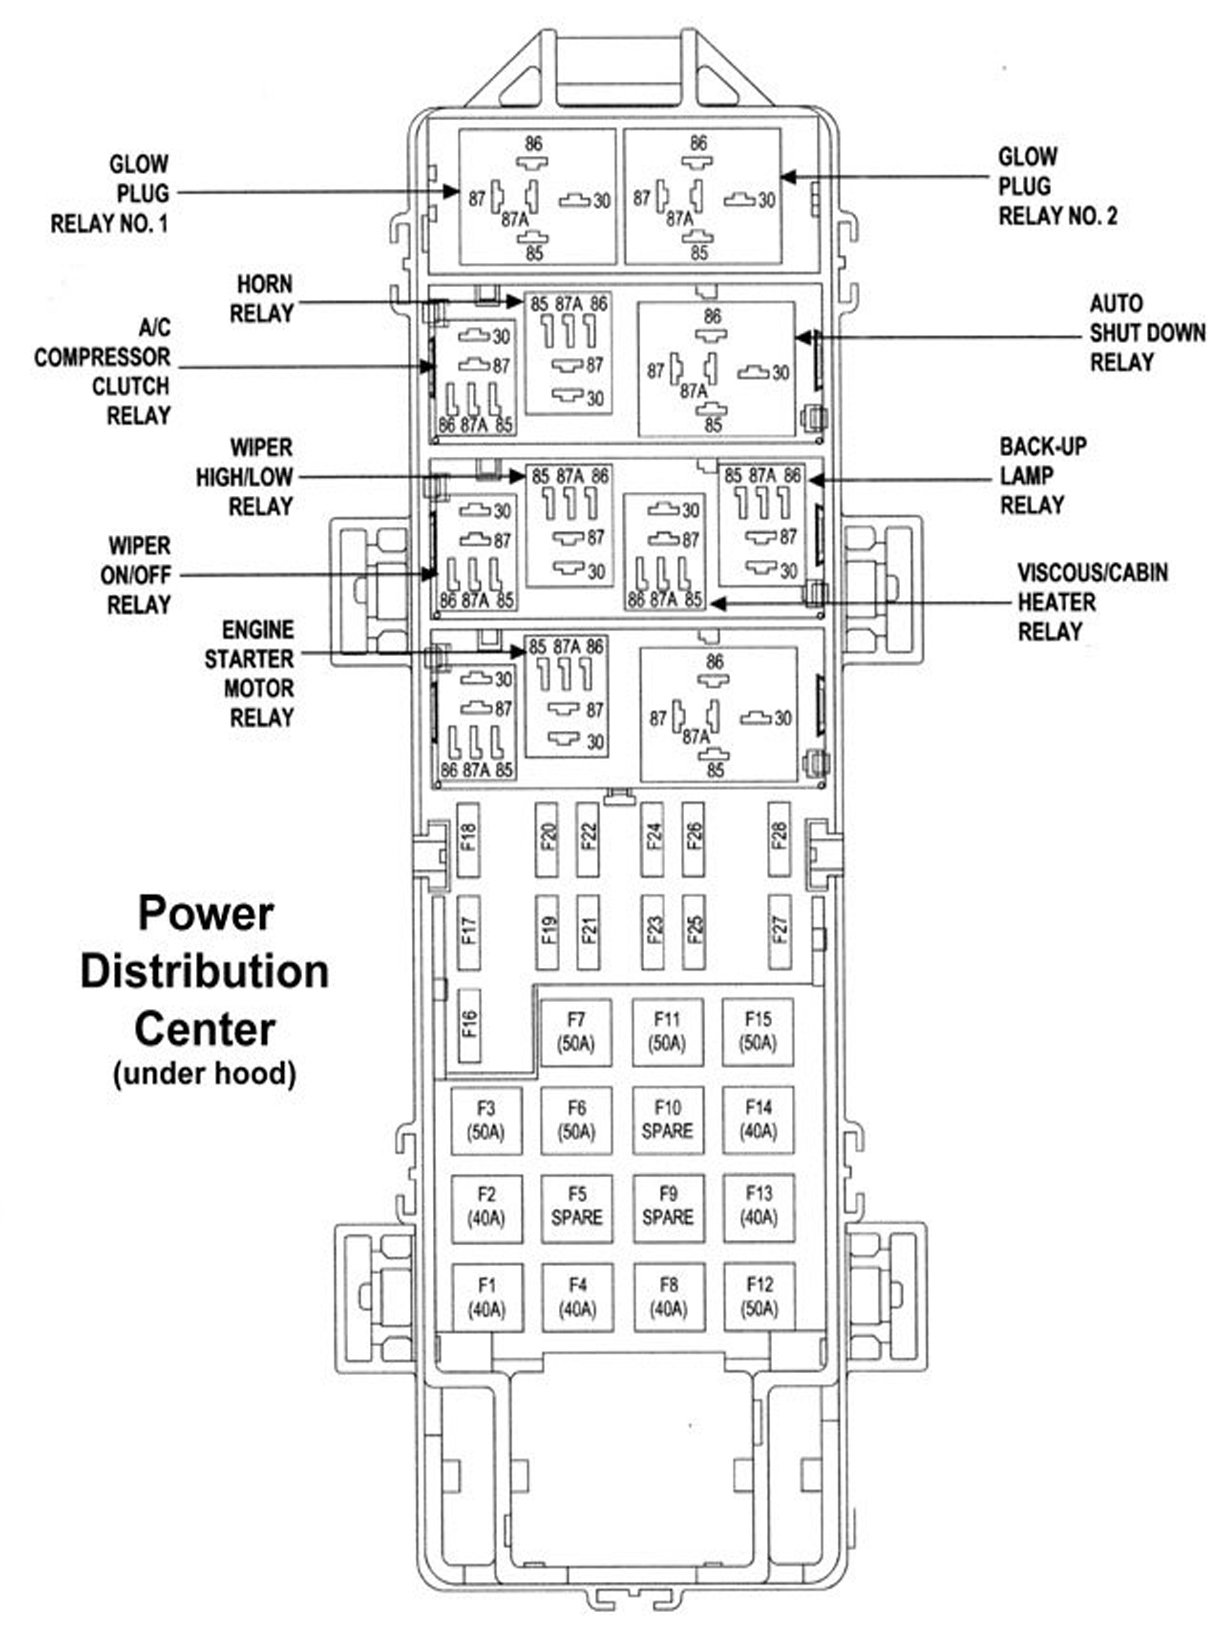 jeep grand cherokee wj 1999 to 2004 fuse box diagram cherokee rh 12 12 reisen fuer meister de